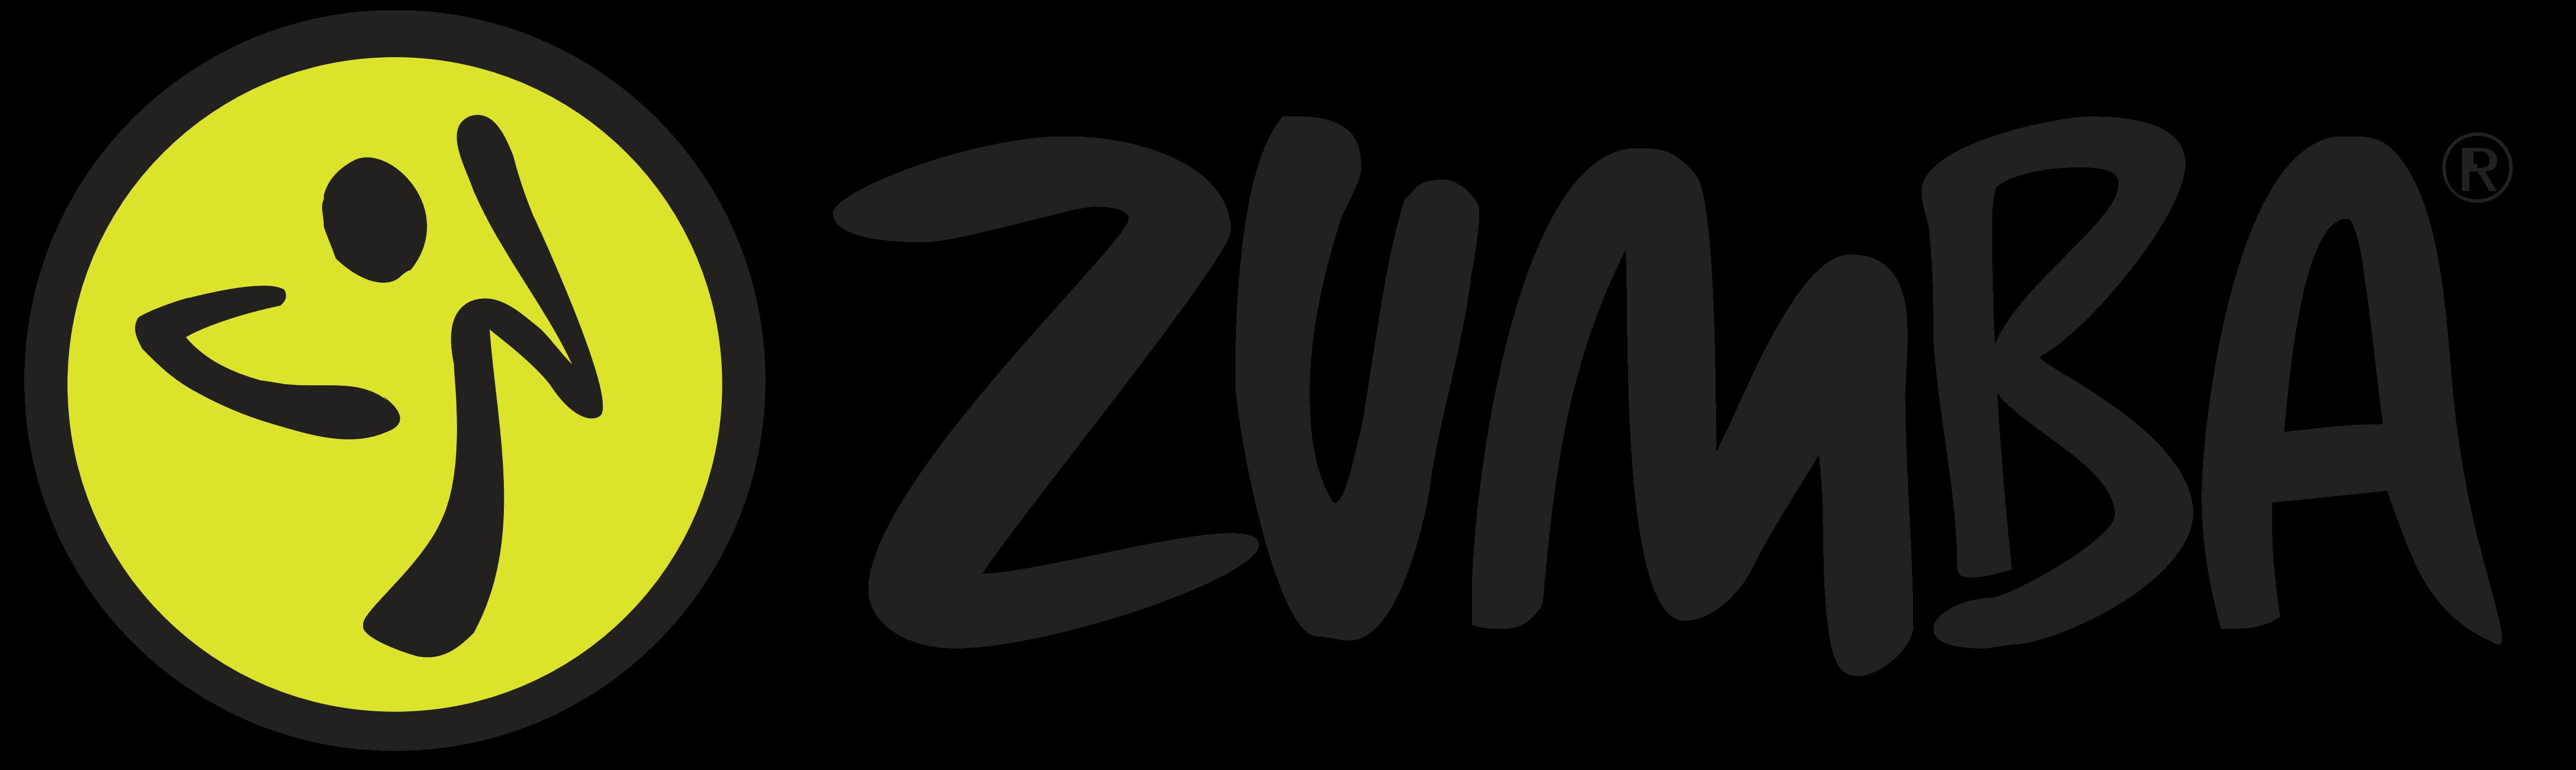 Zumba with Onyeka